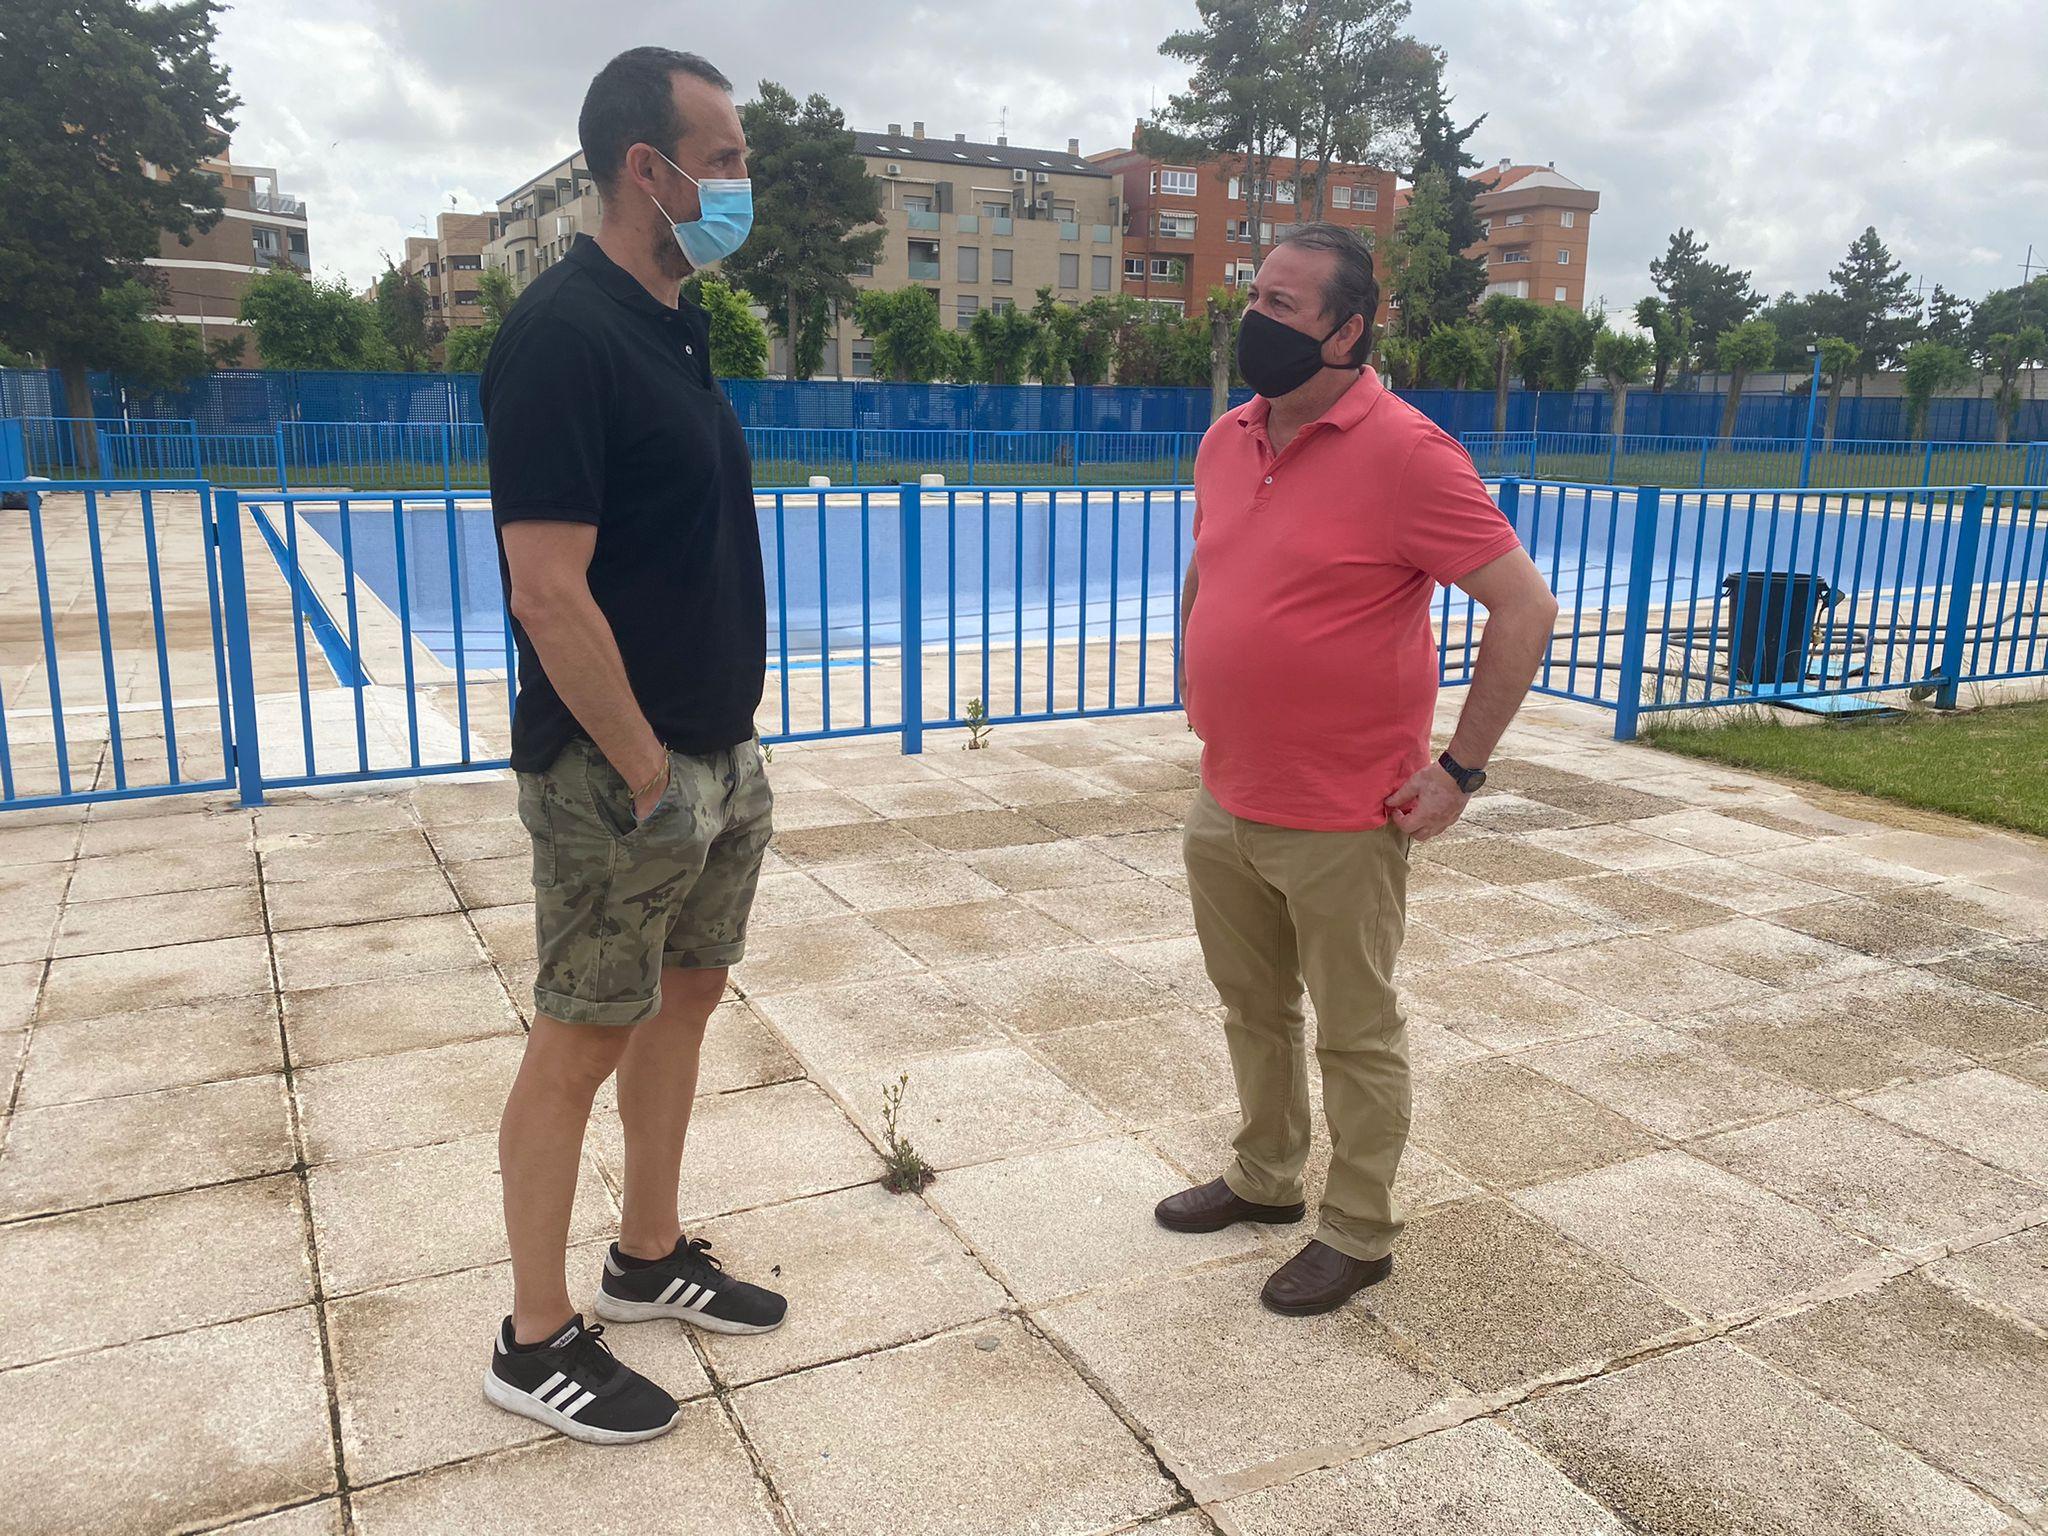 foto apertura piscina verano   Liberal de Castilla